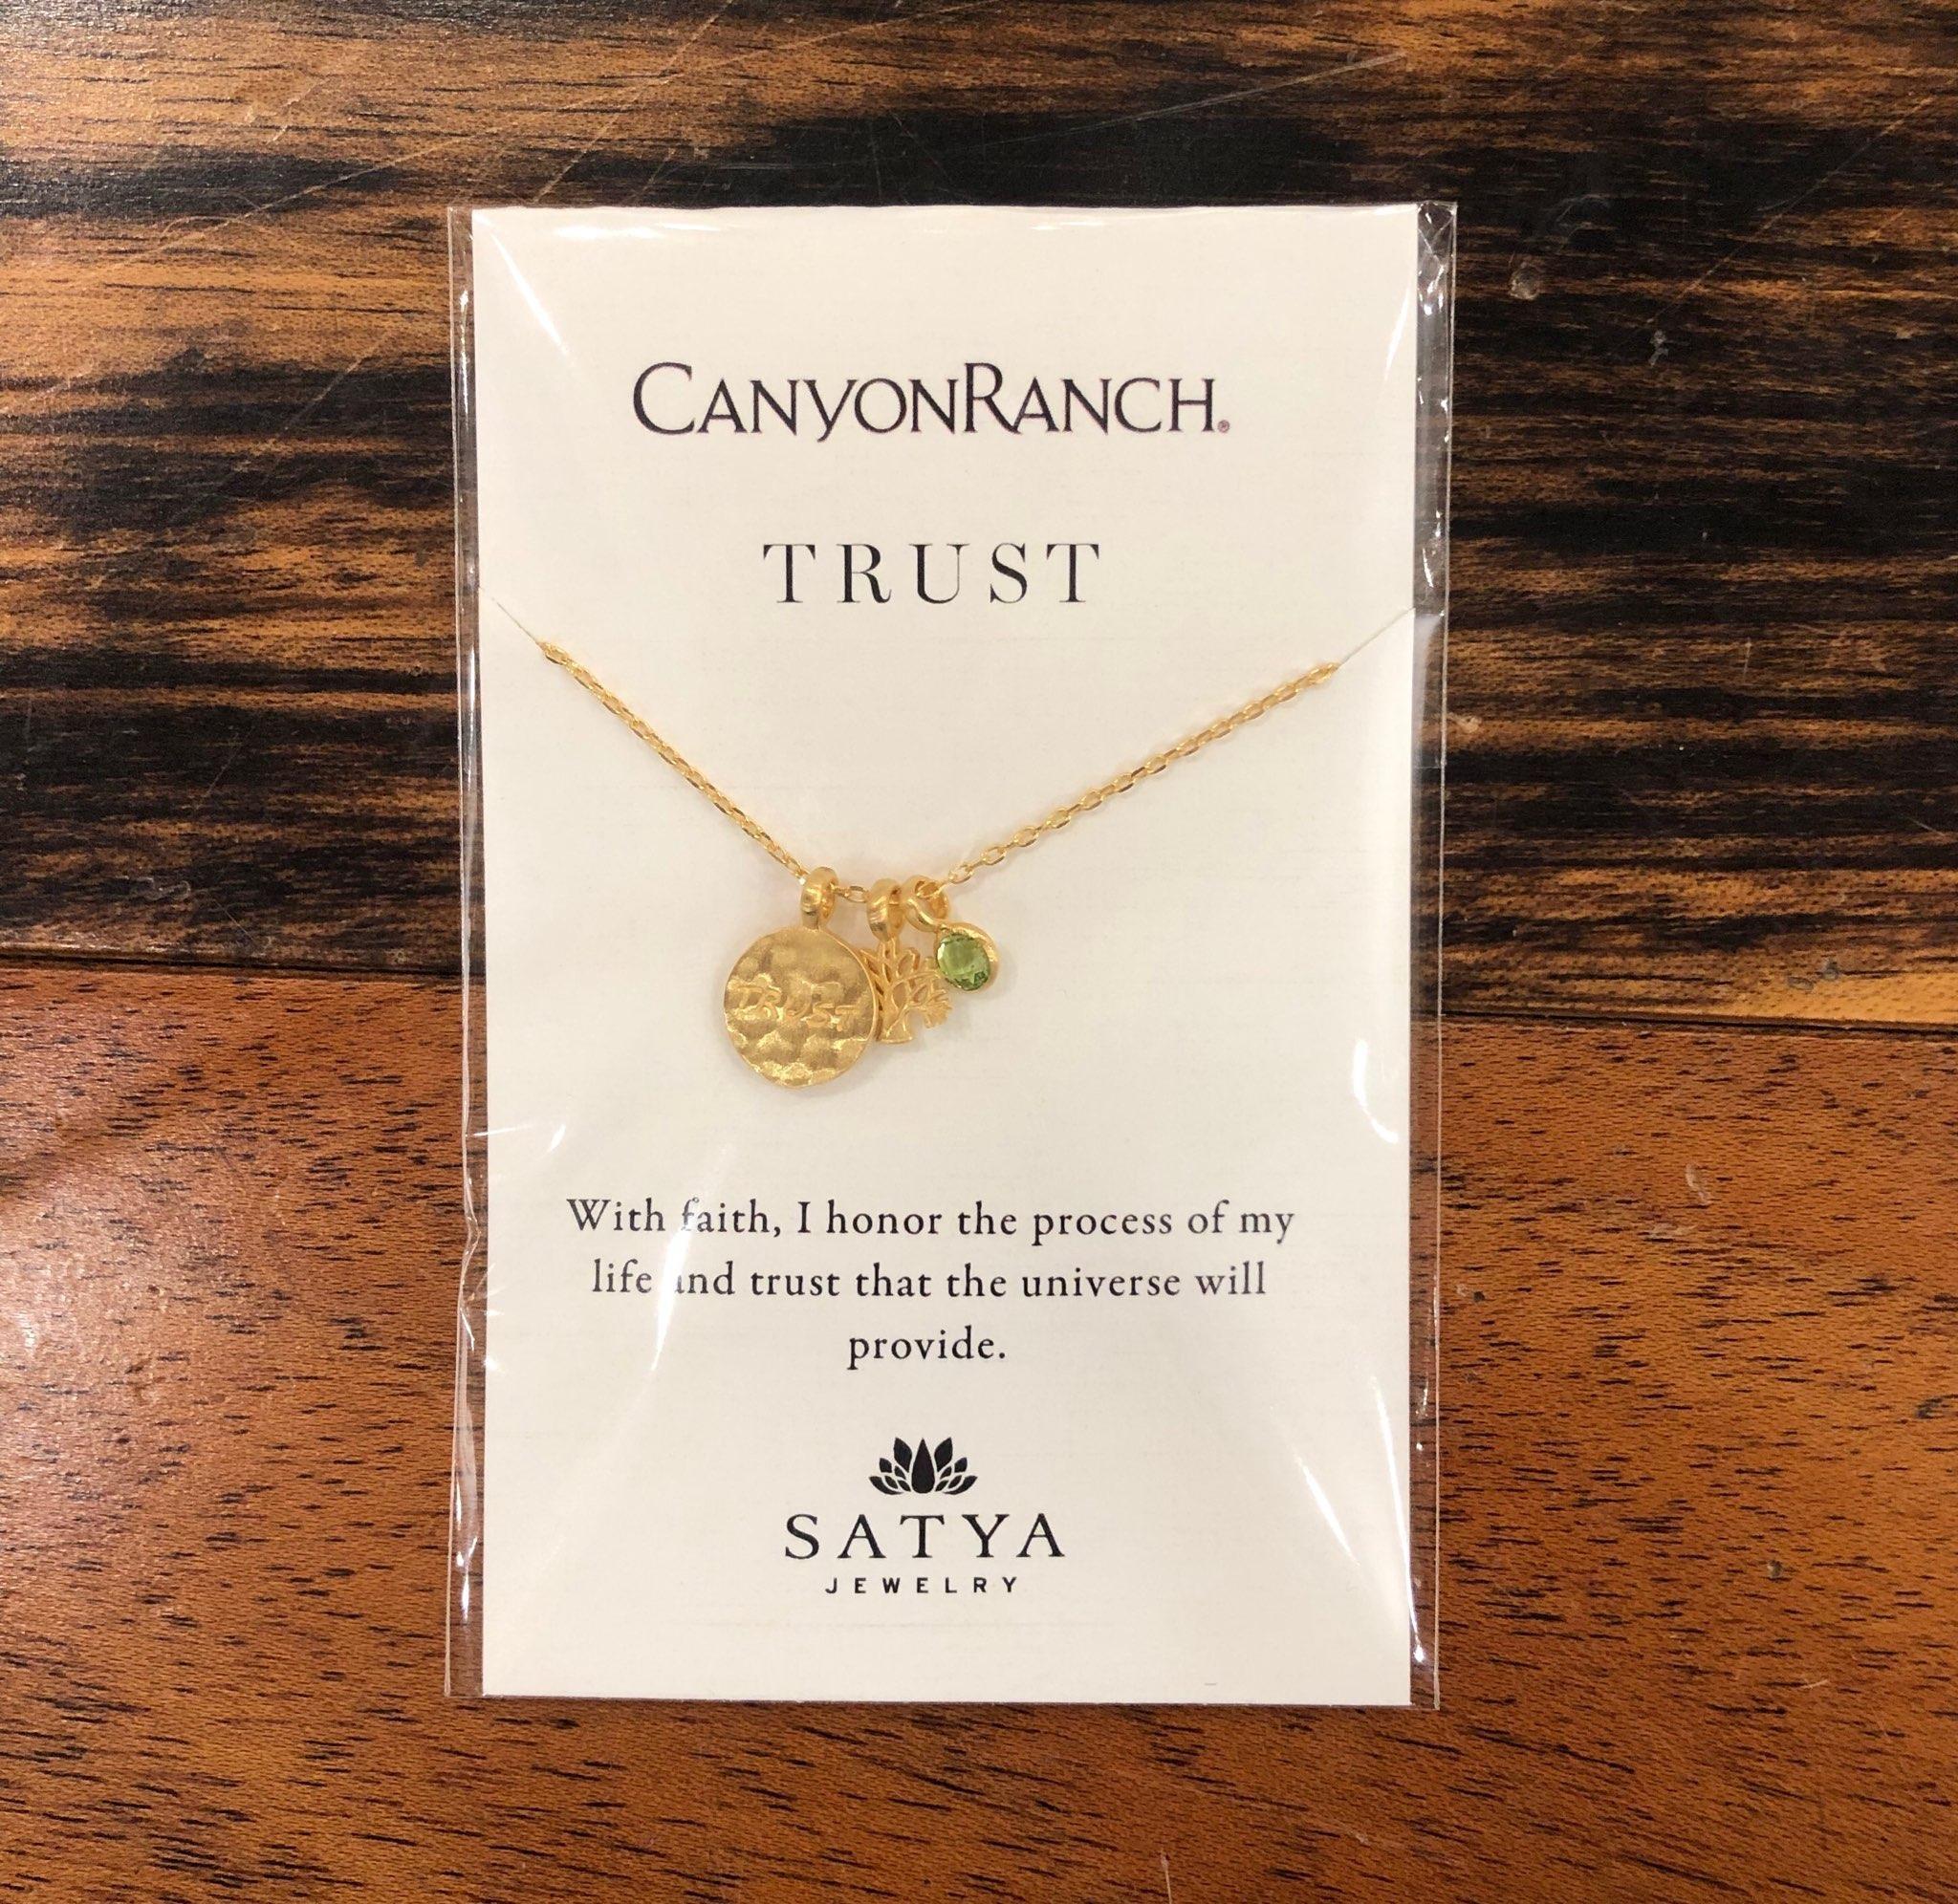 Satya x Canyon Ranch Trust Tree Peridot Necklace